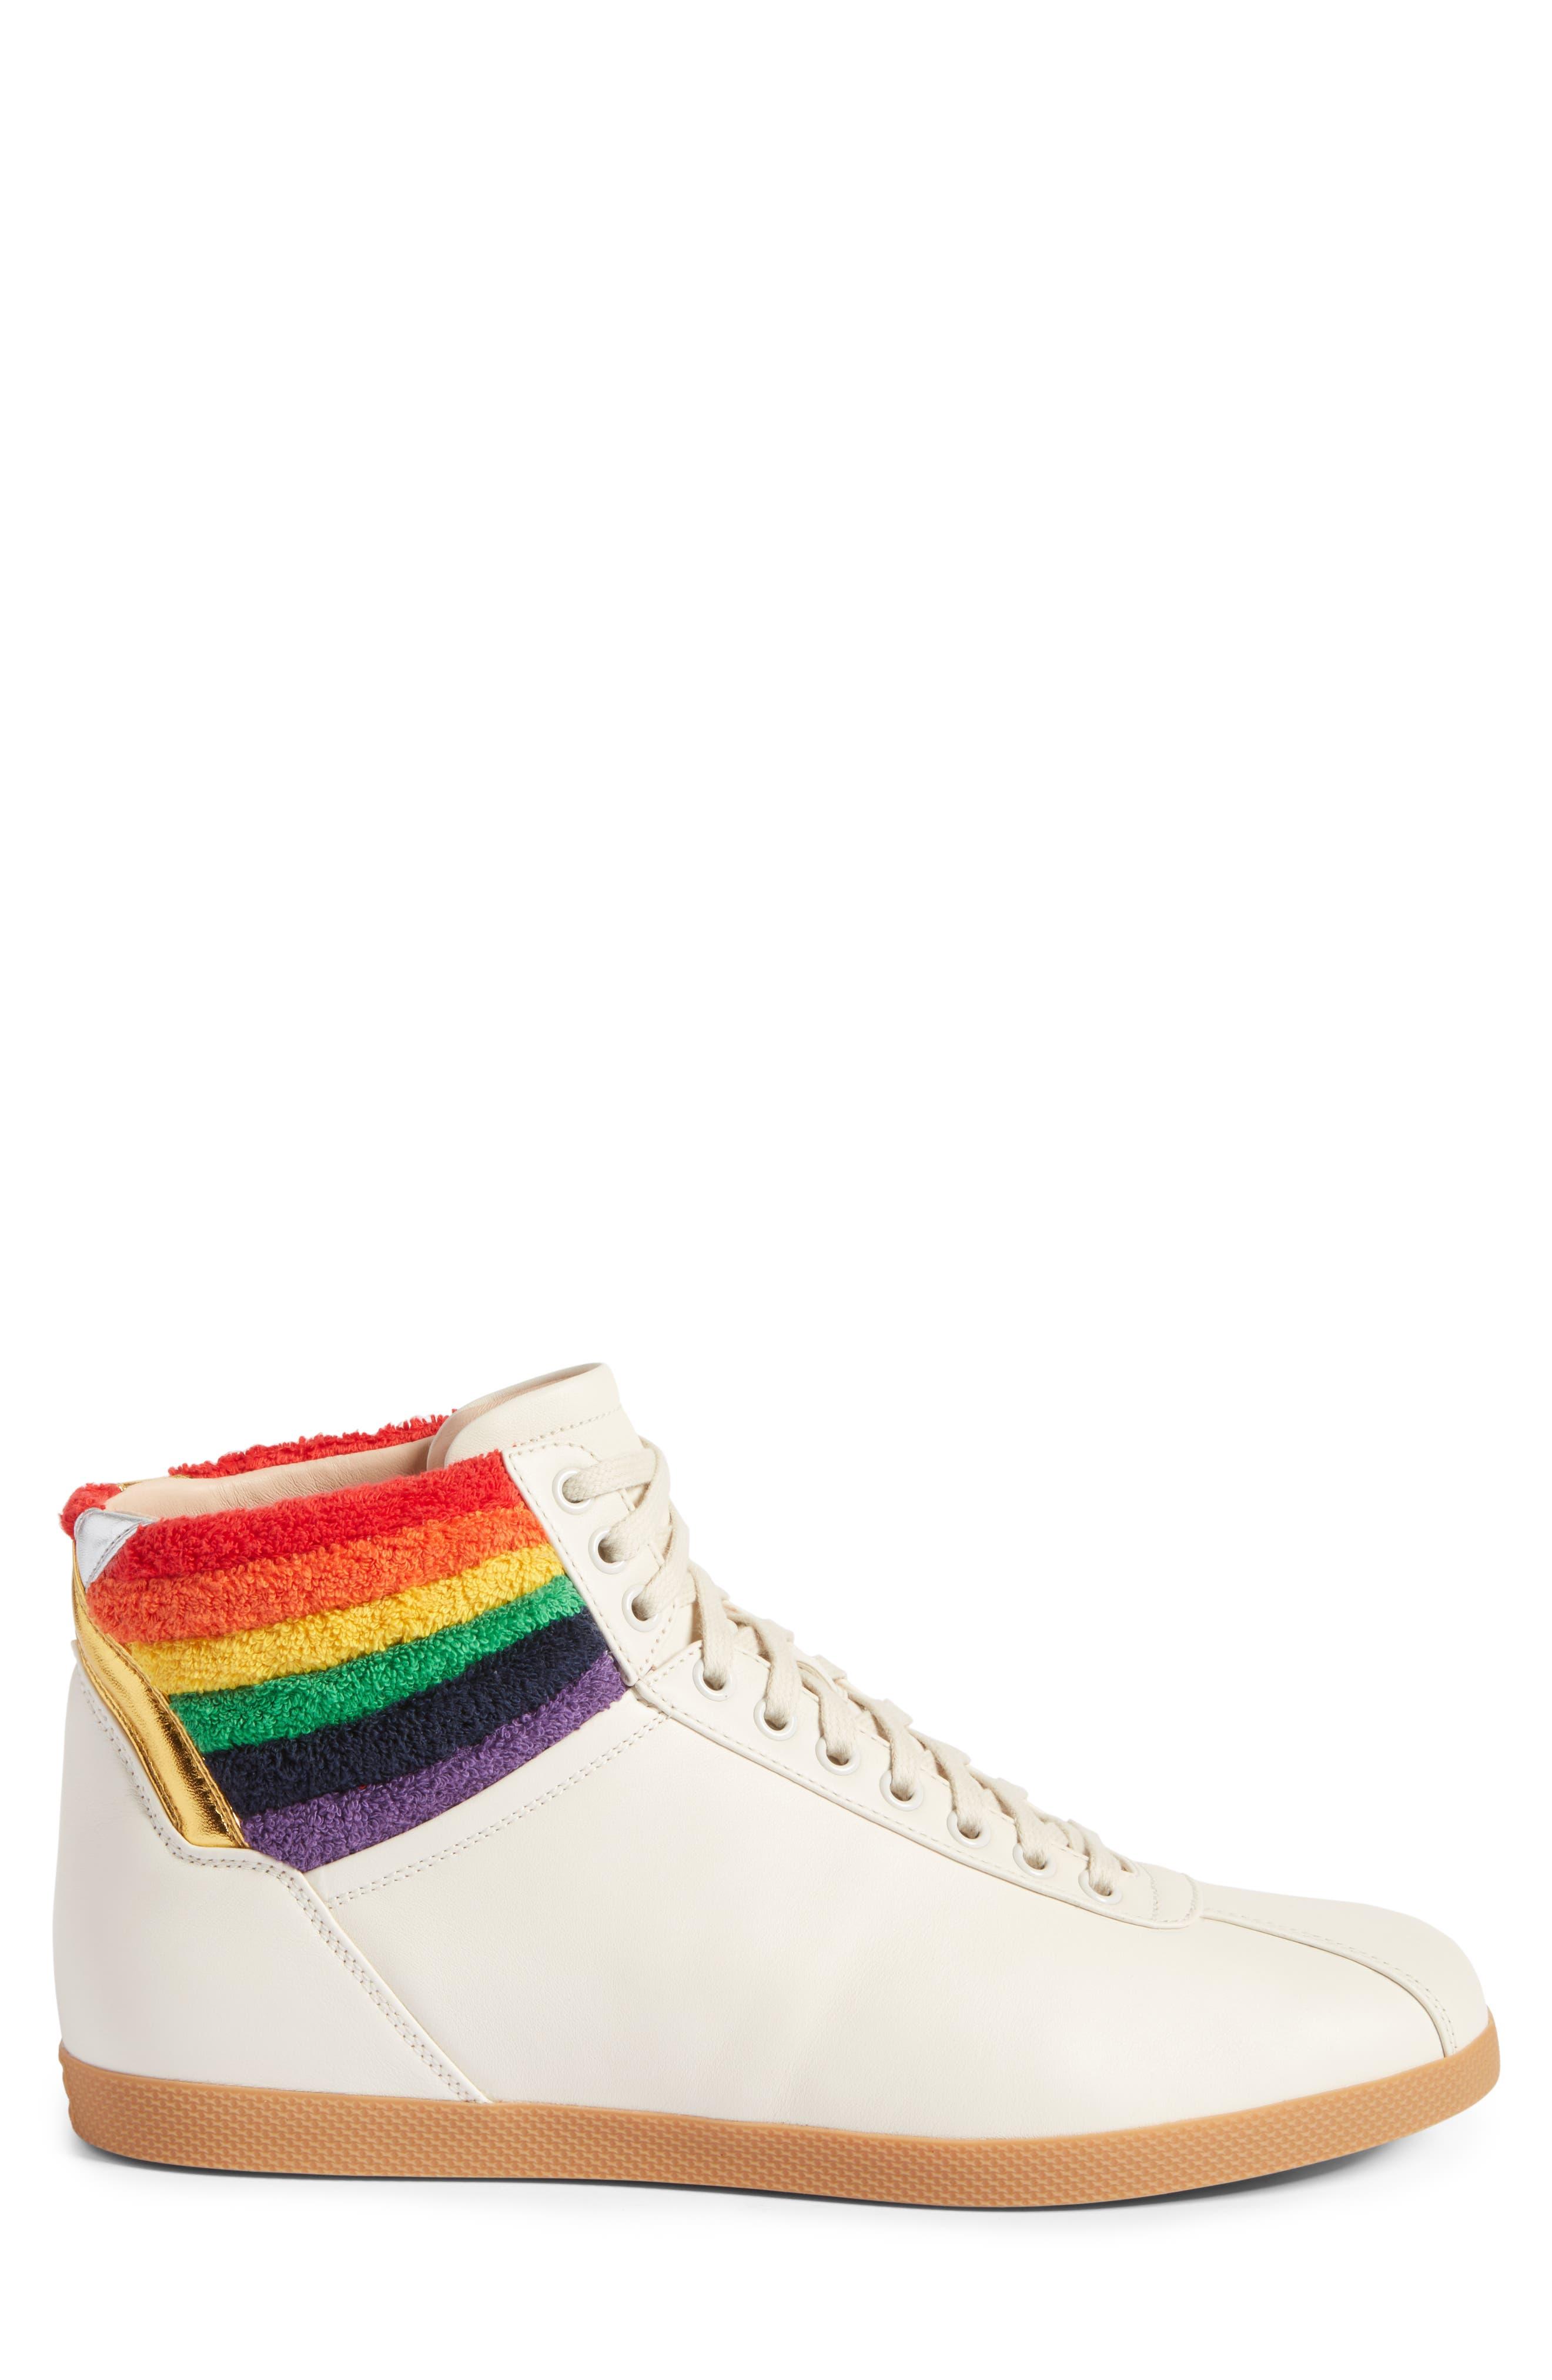 Bambi Rainbow Terry High Top Sneaker,                             Alternate thumbnail 3, color,